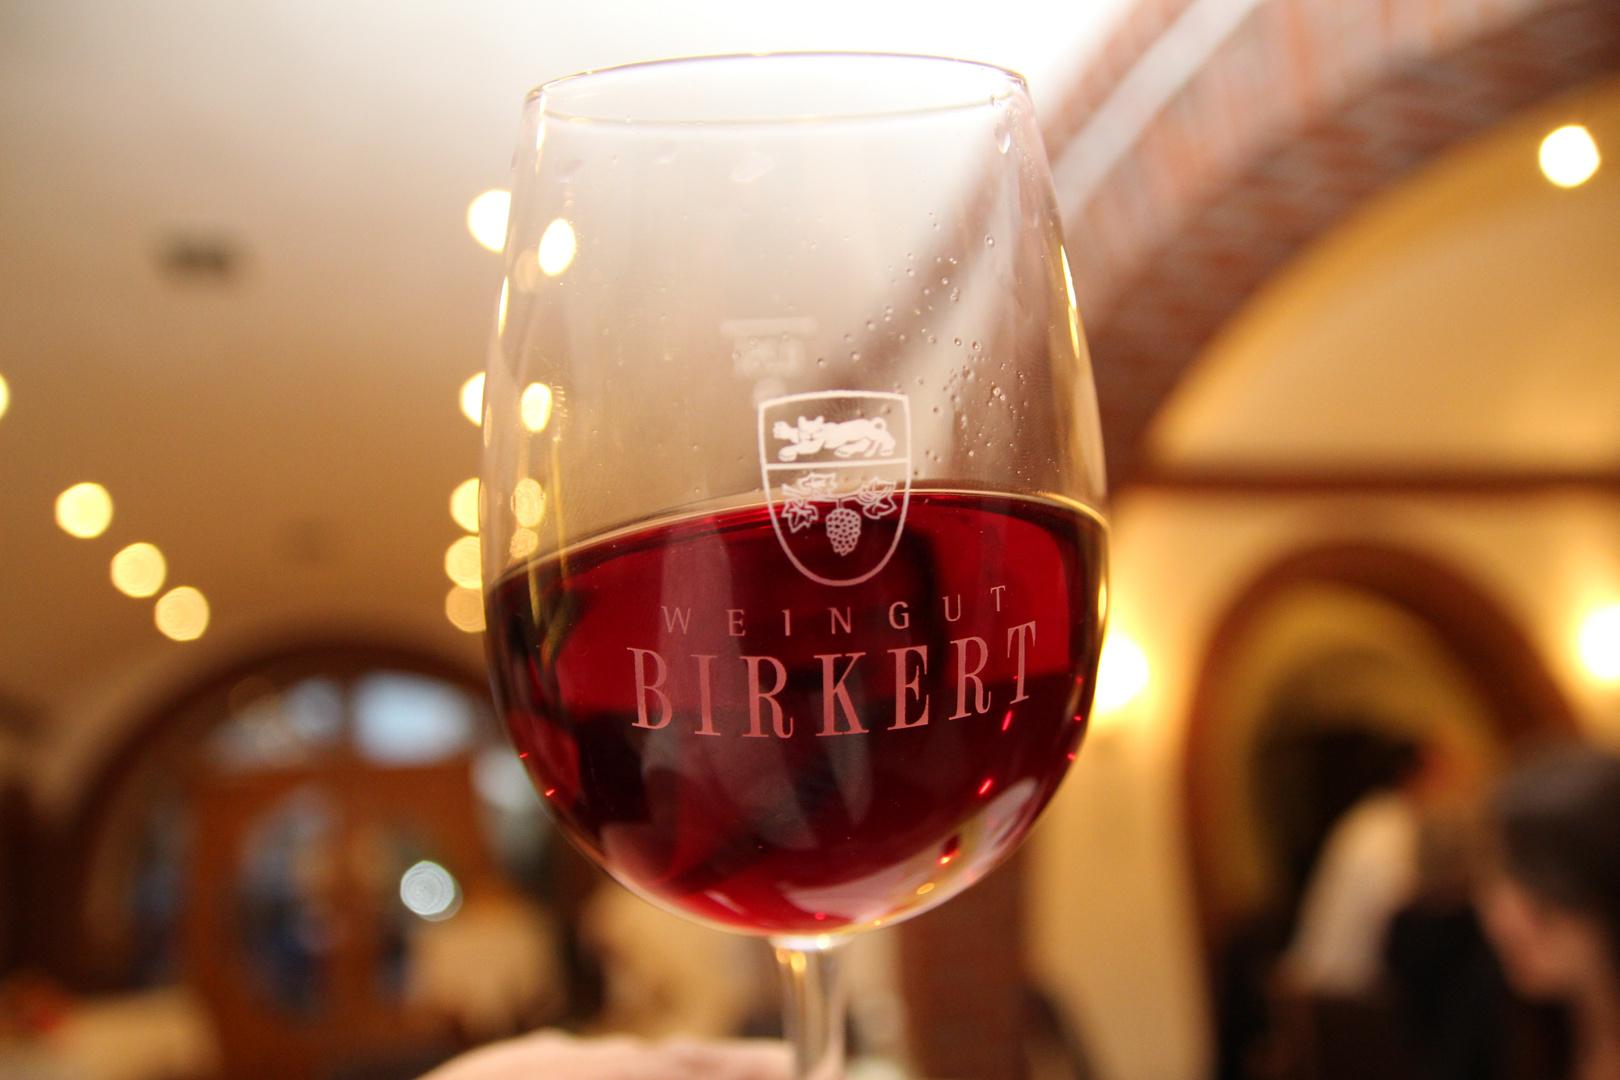 Weingut Birkert